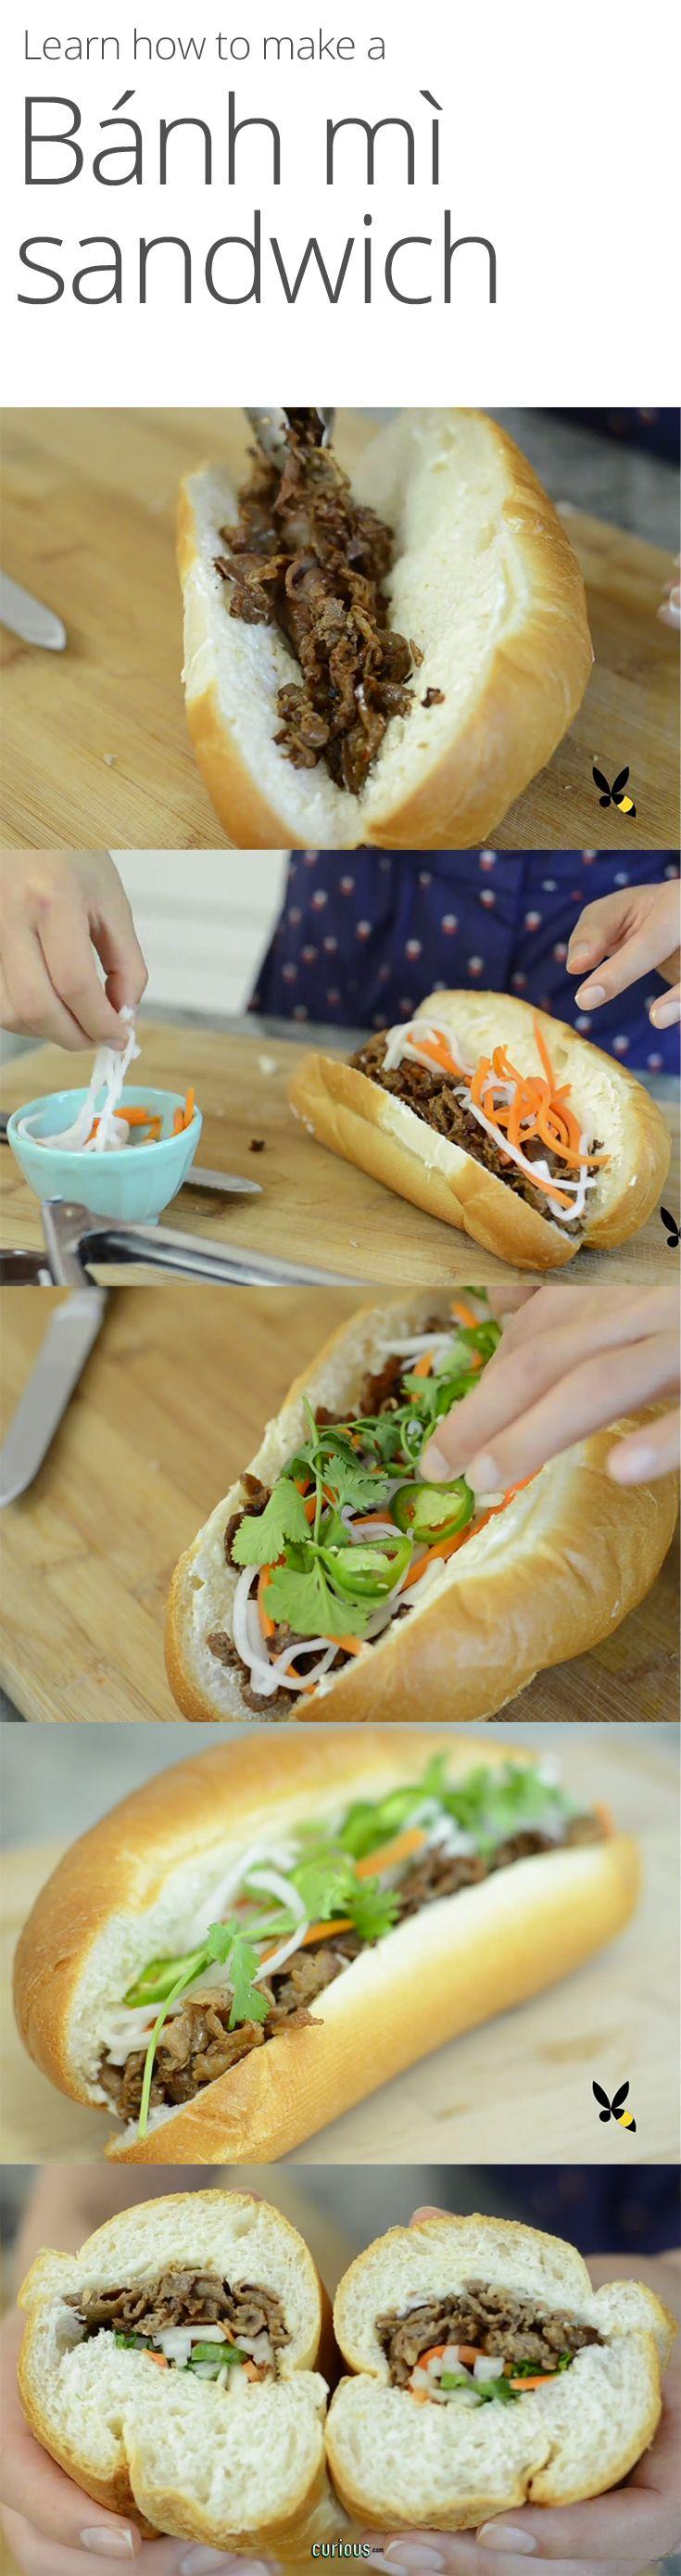 Vietnamese Banh Mi Sandwich | Vietnamese Food | Pinterest